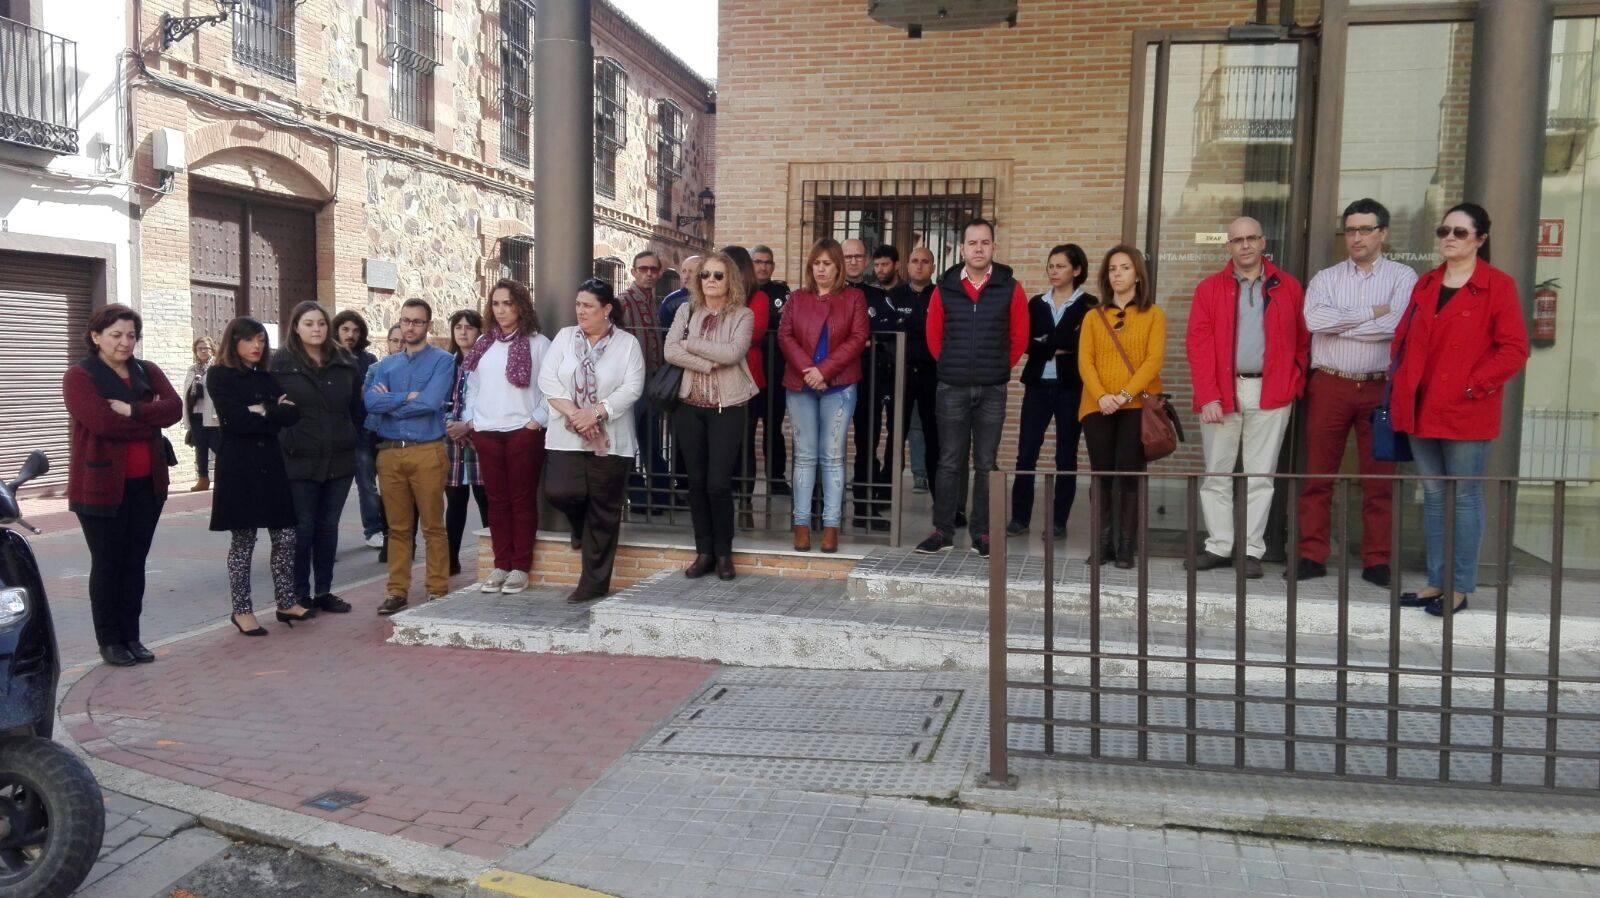 Silencio en Herencia contra la violencia de género en apoyo a Campo de Criptana 5